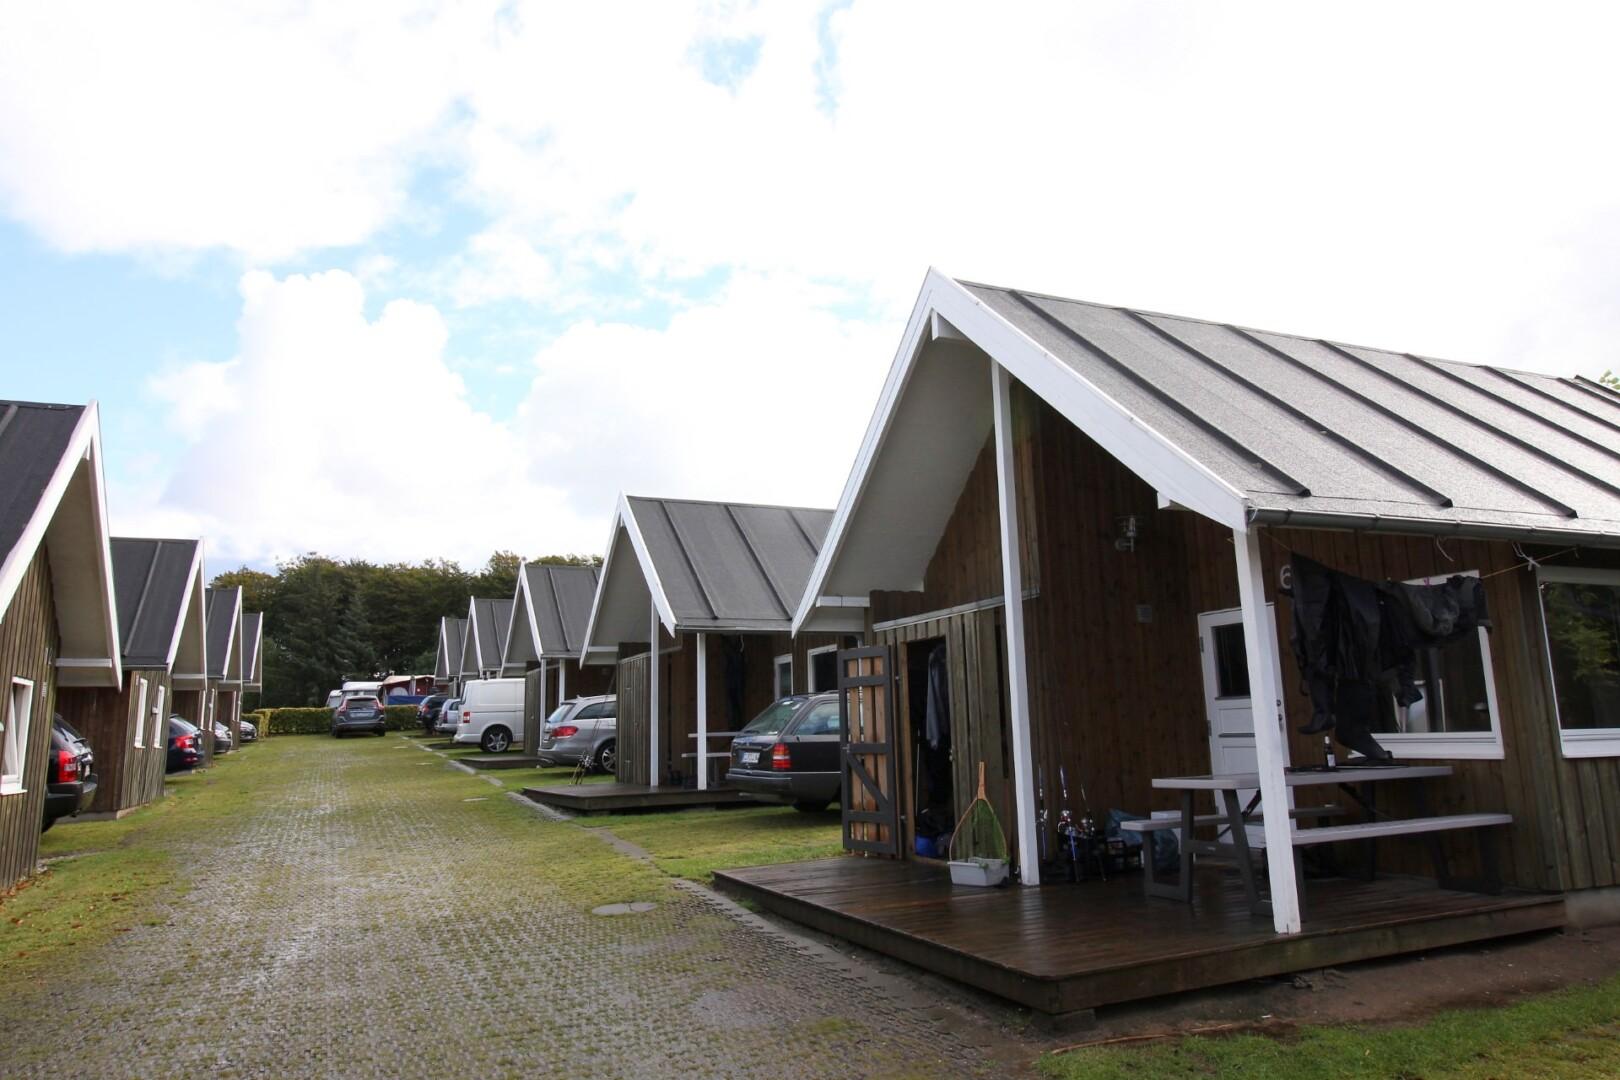 Campingplatz in Dänemark mit Anglerhütten